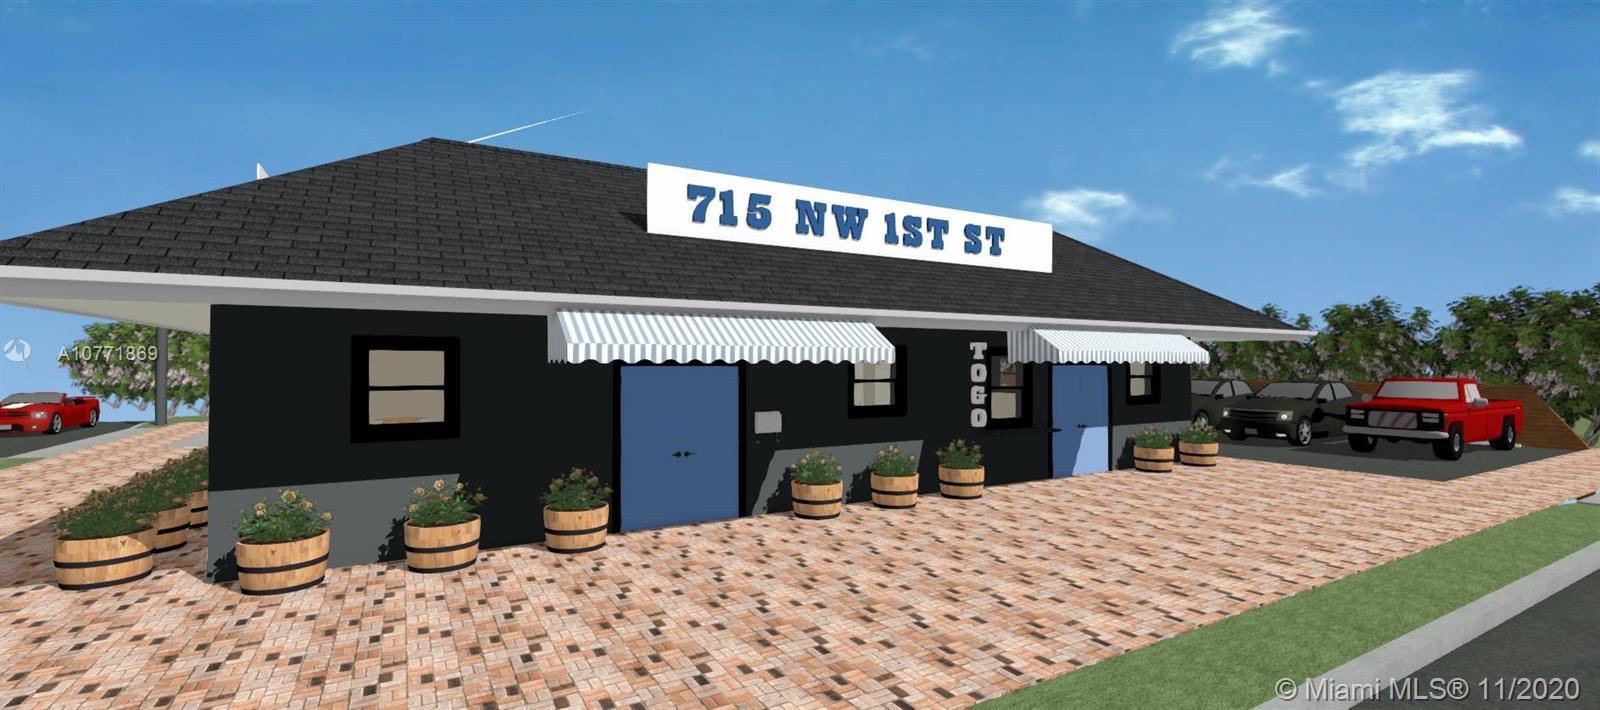 715 NW 1st St, Dania Beach, FL 33004